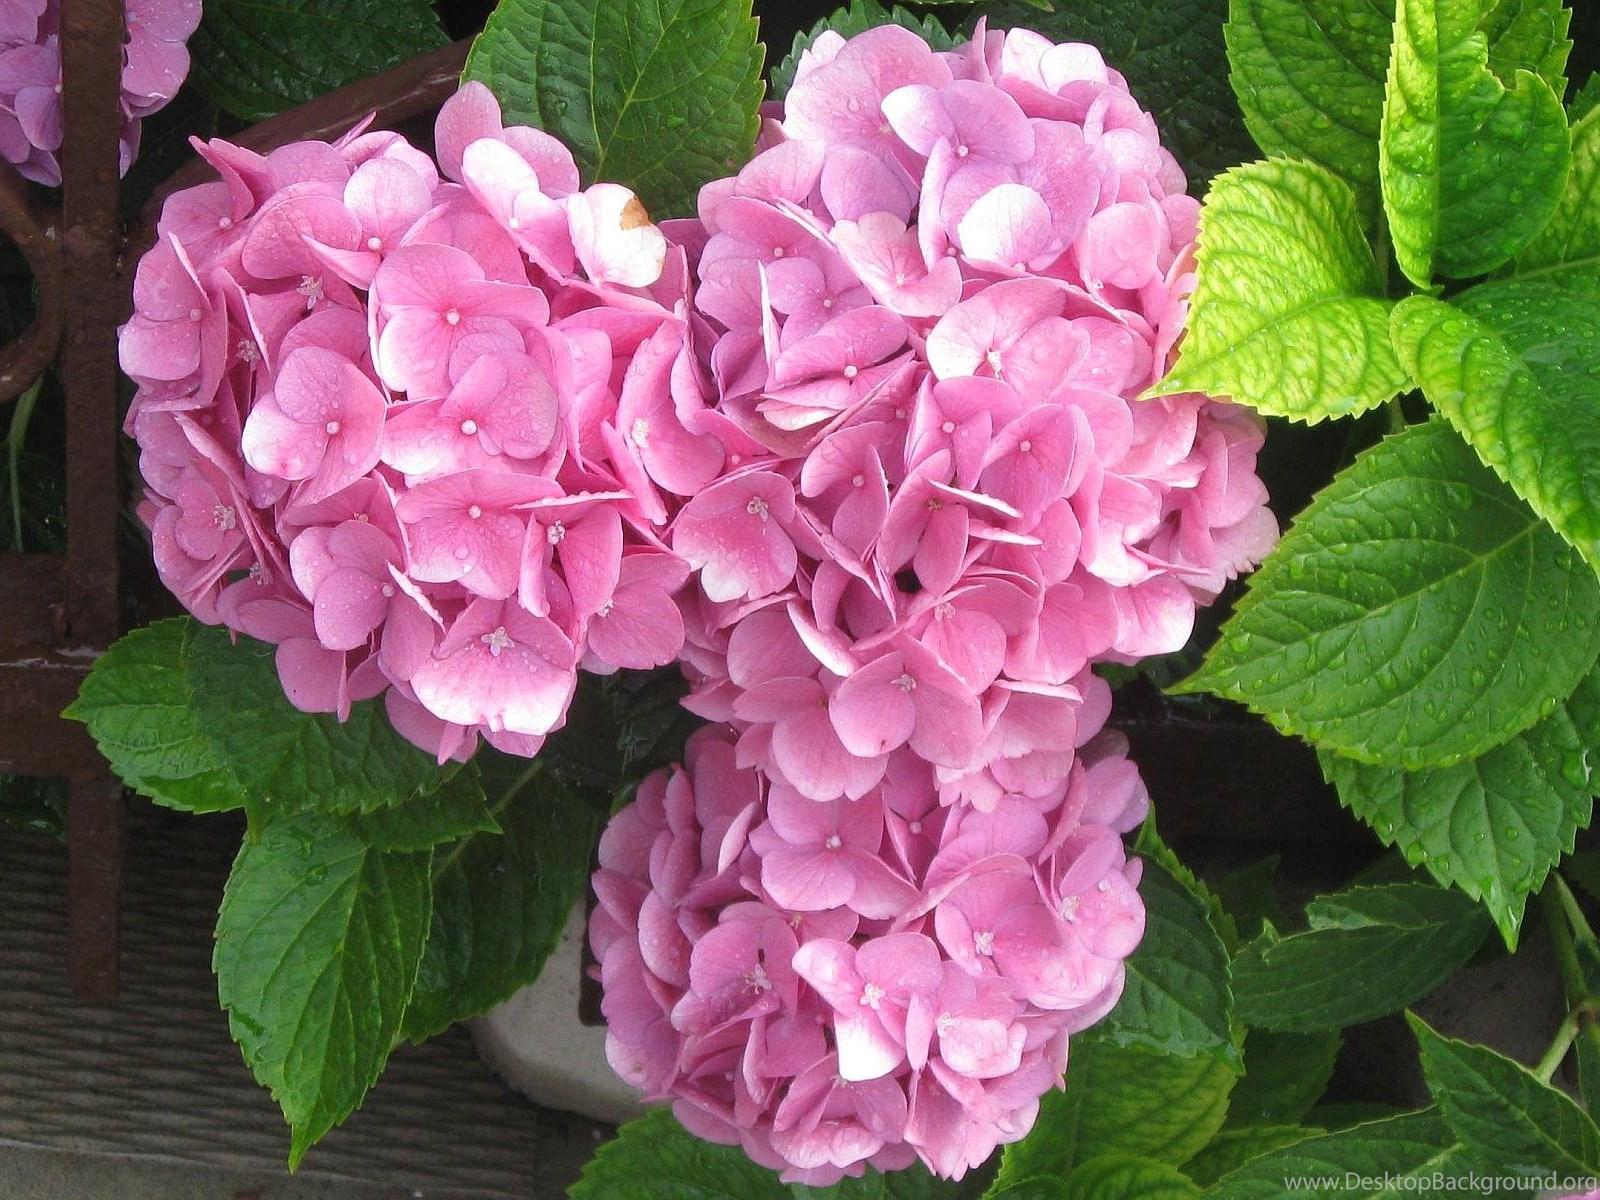 Beautiful Summer Flowers Wallpapers For Desktop Photography Heat